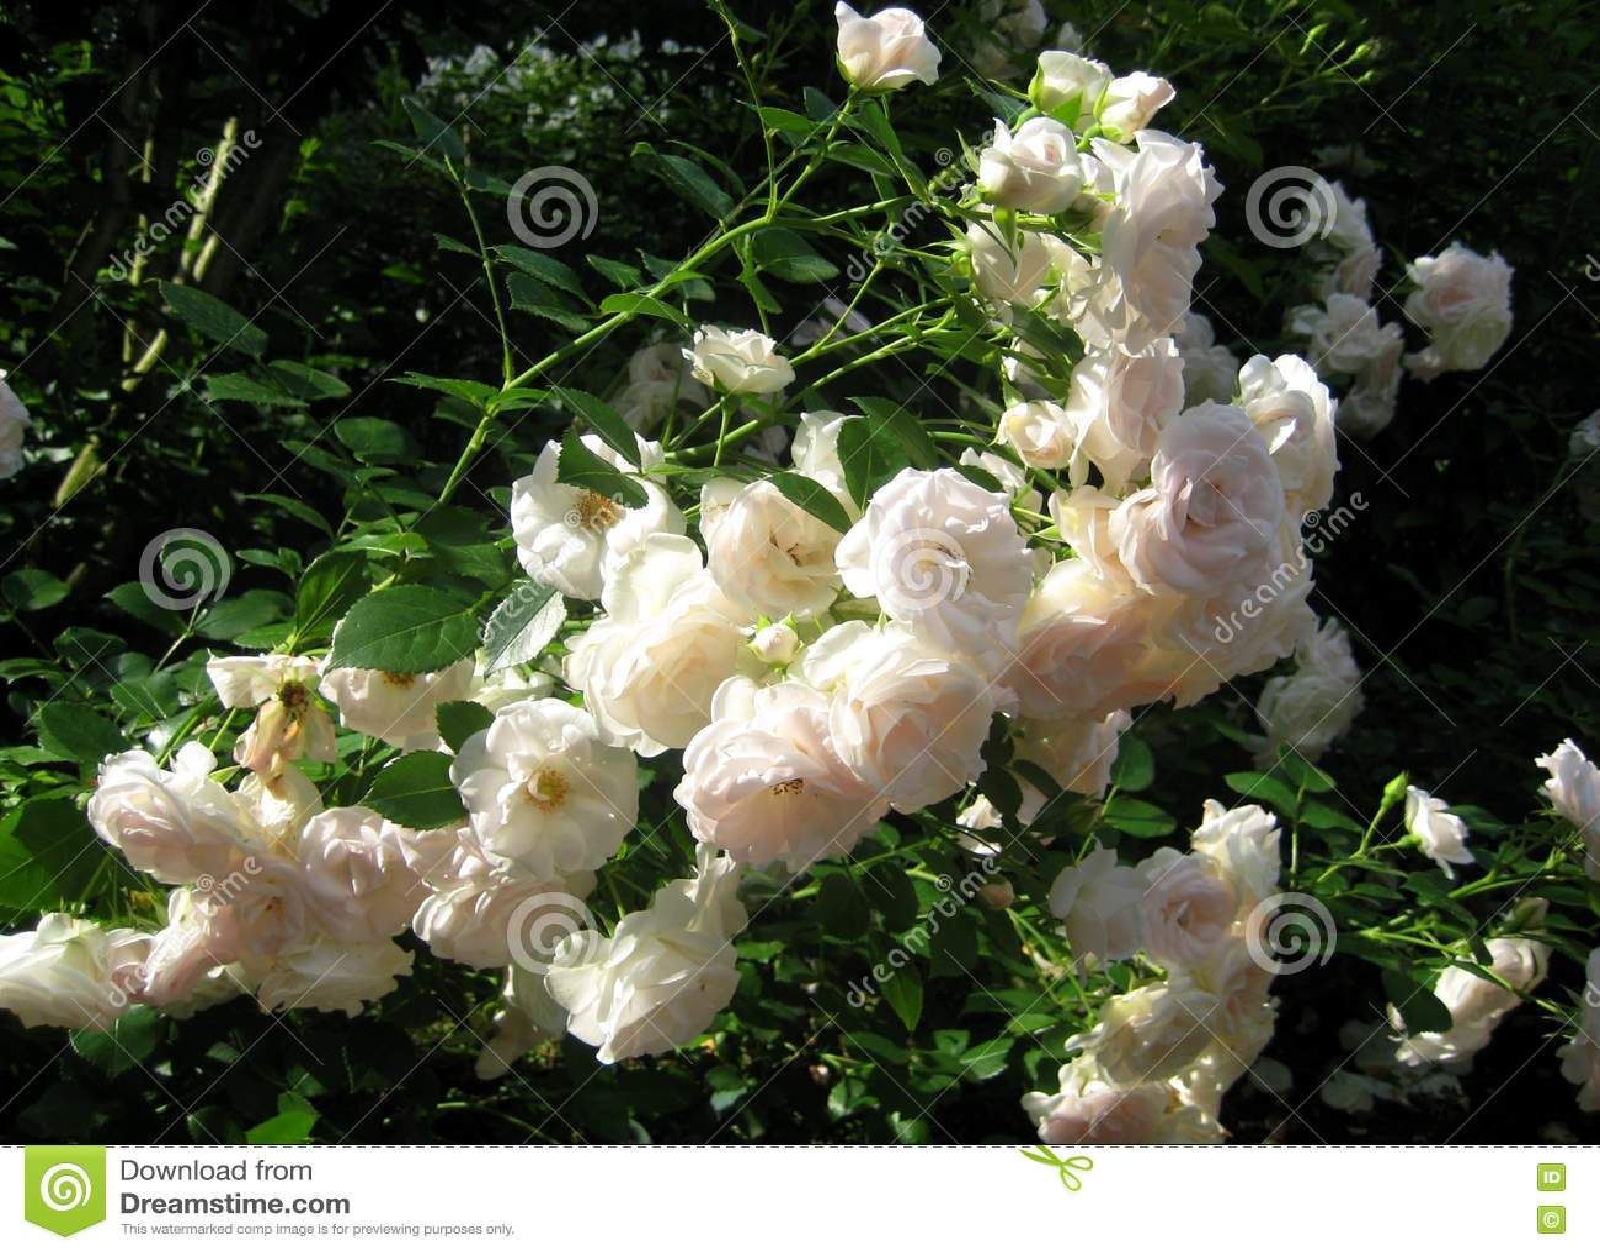 Macro Photo Lush Flowering Bushes Garden Roses With White Flowers